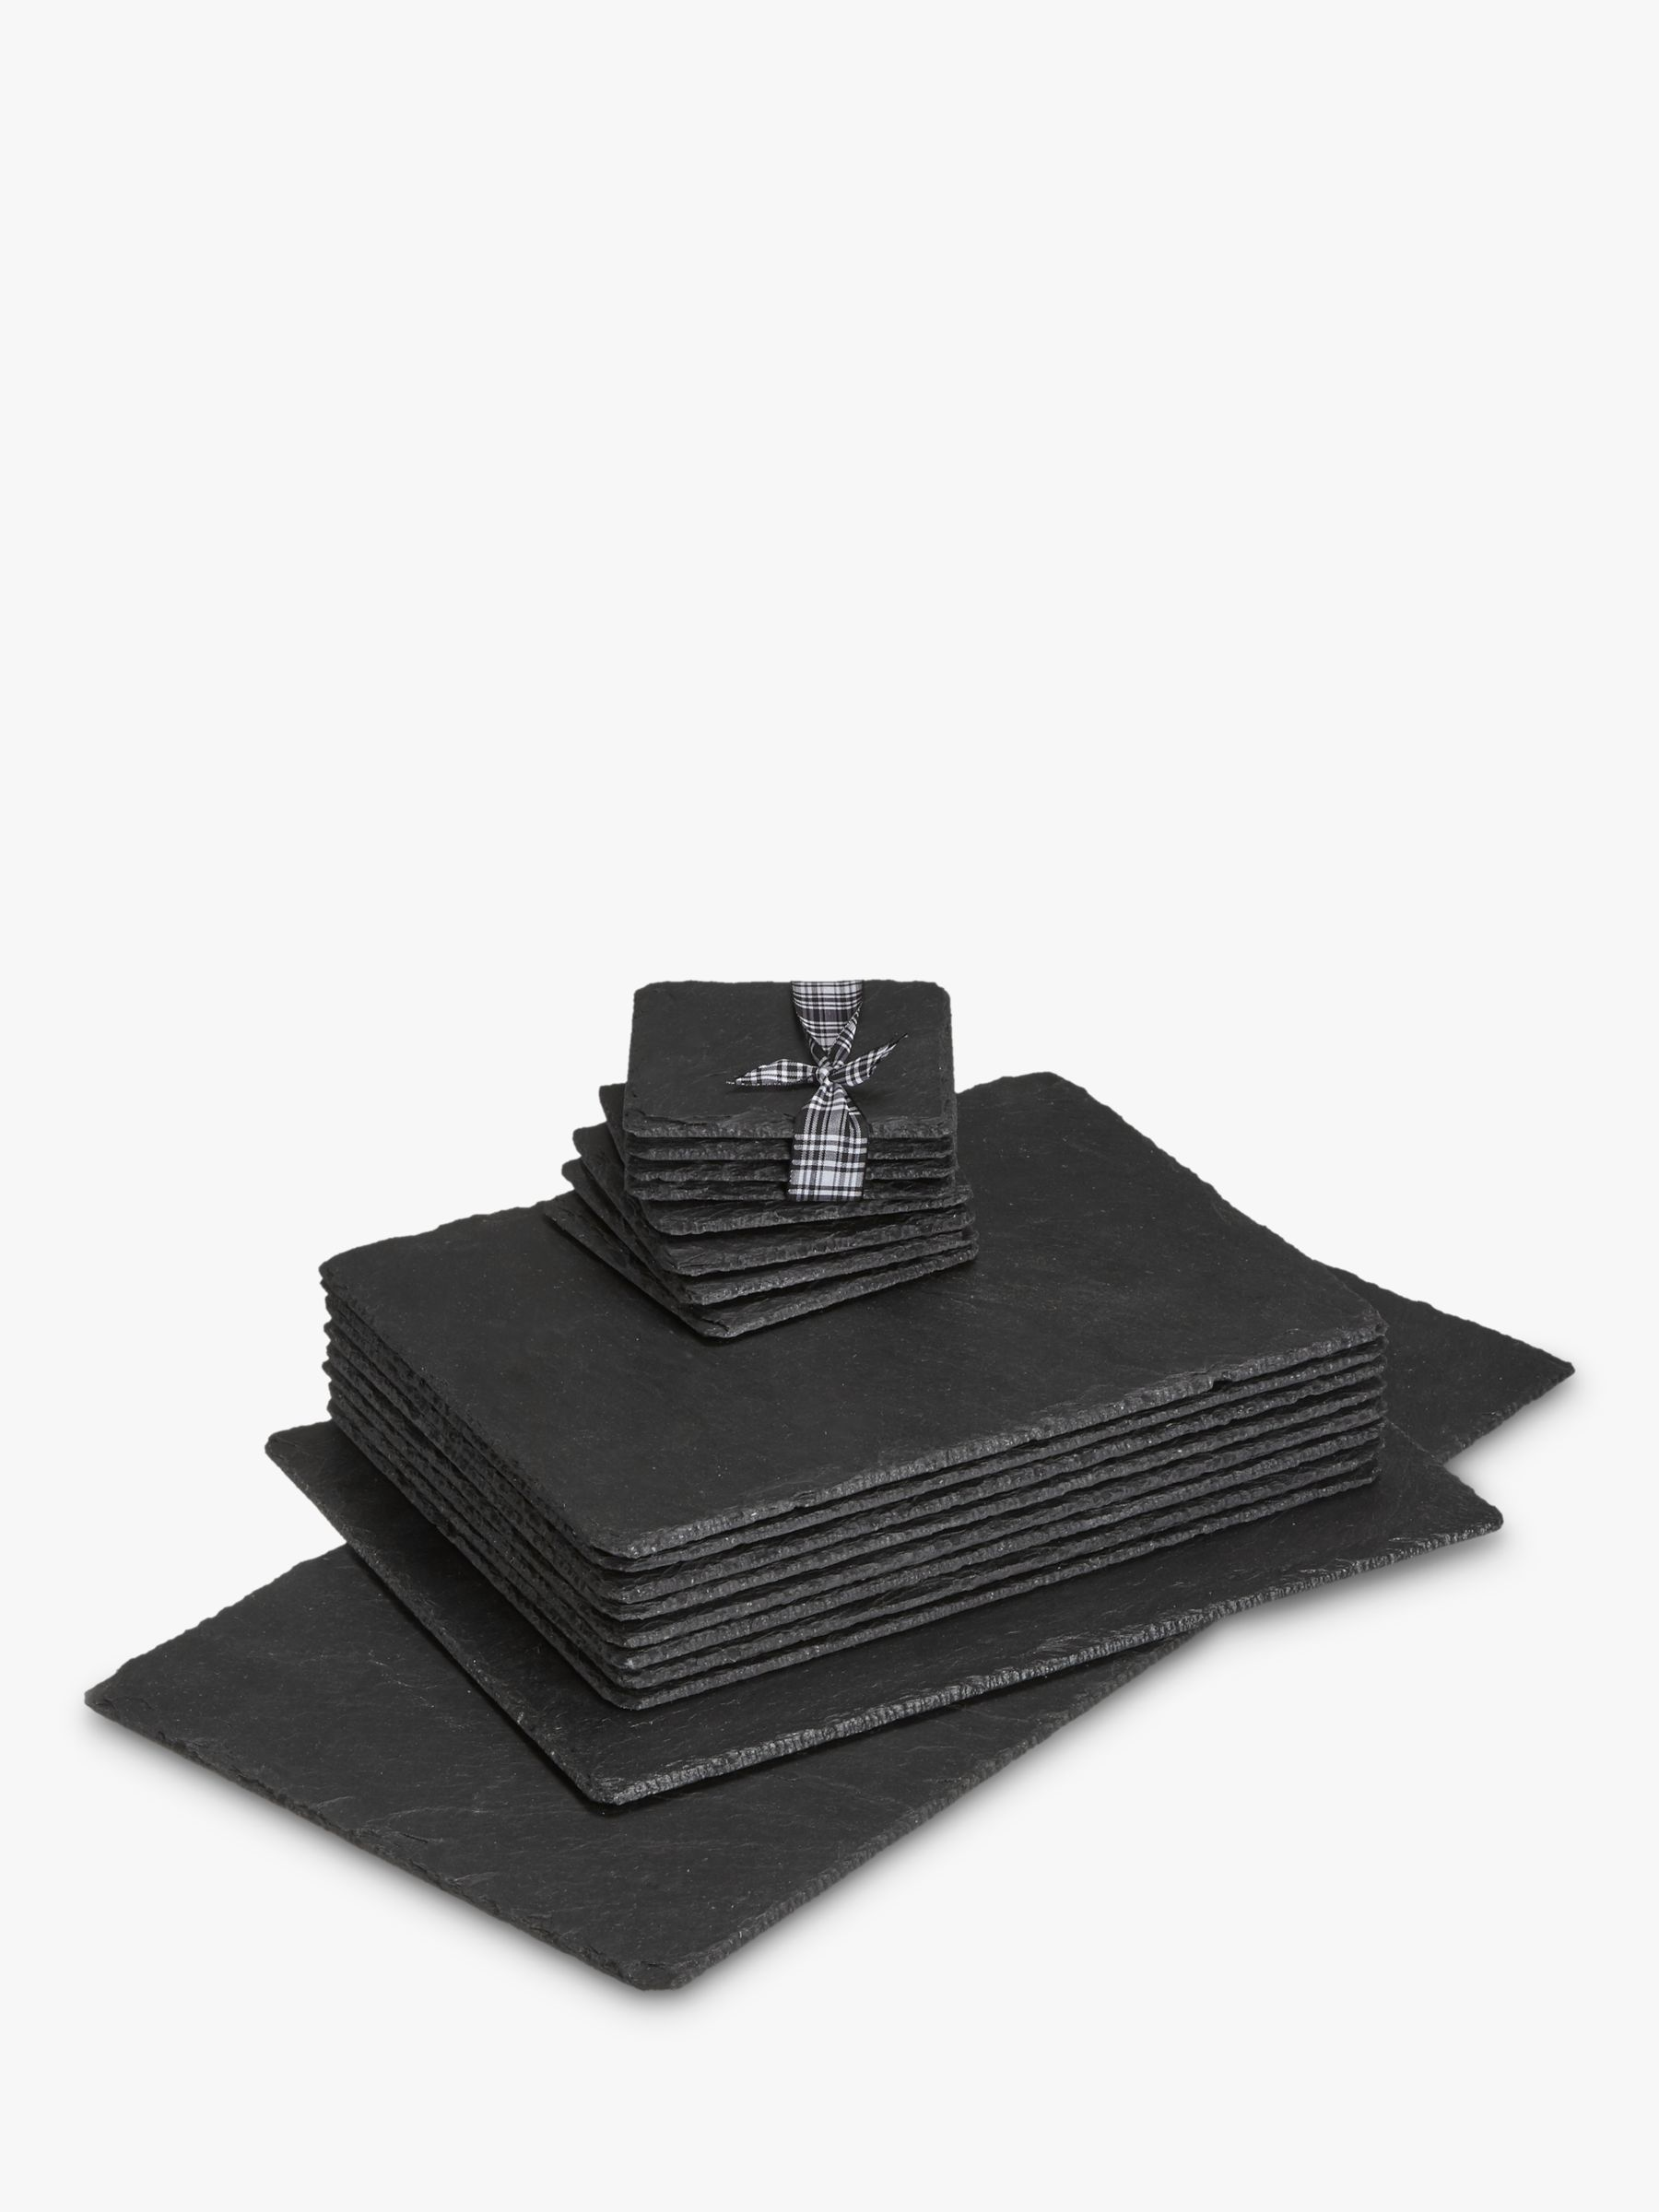 Just Slate Just Slate Gift Set, Large